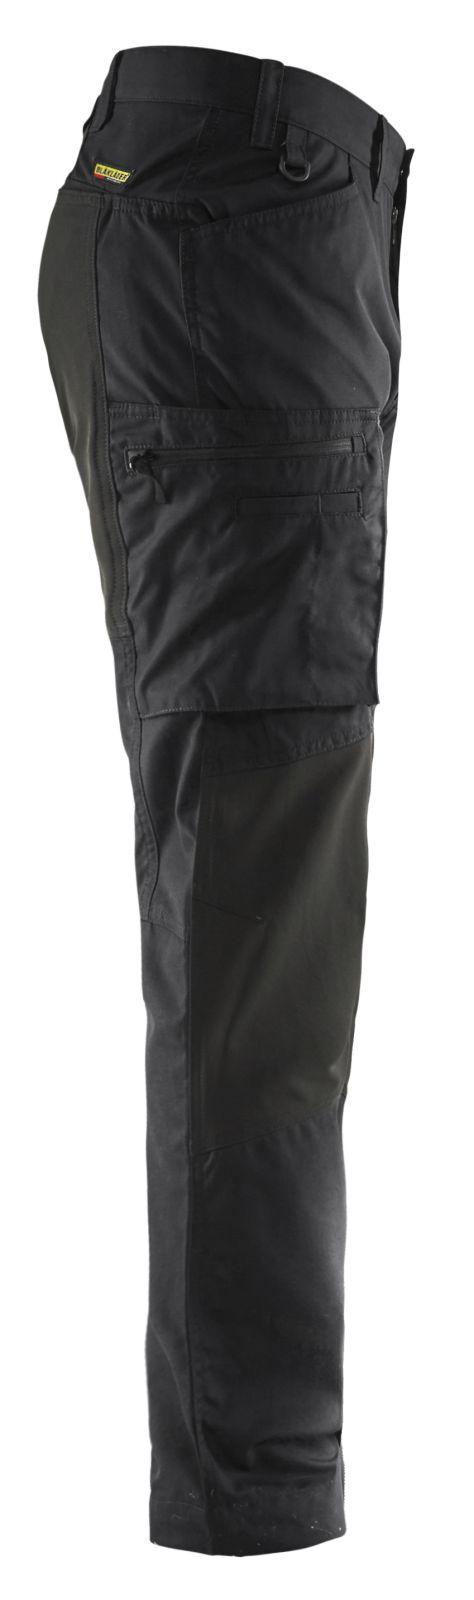 Blaklader Broeken 14591845 met Stretch zwart(9900)